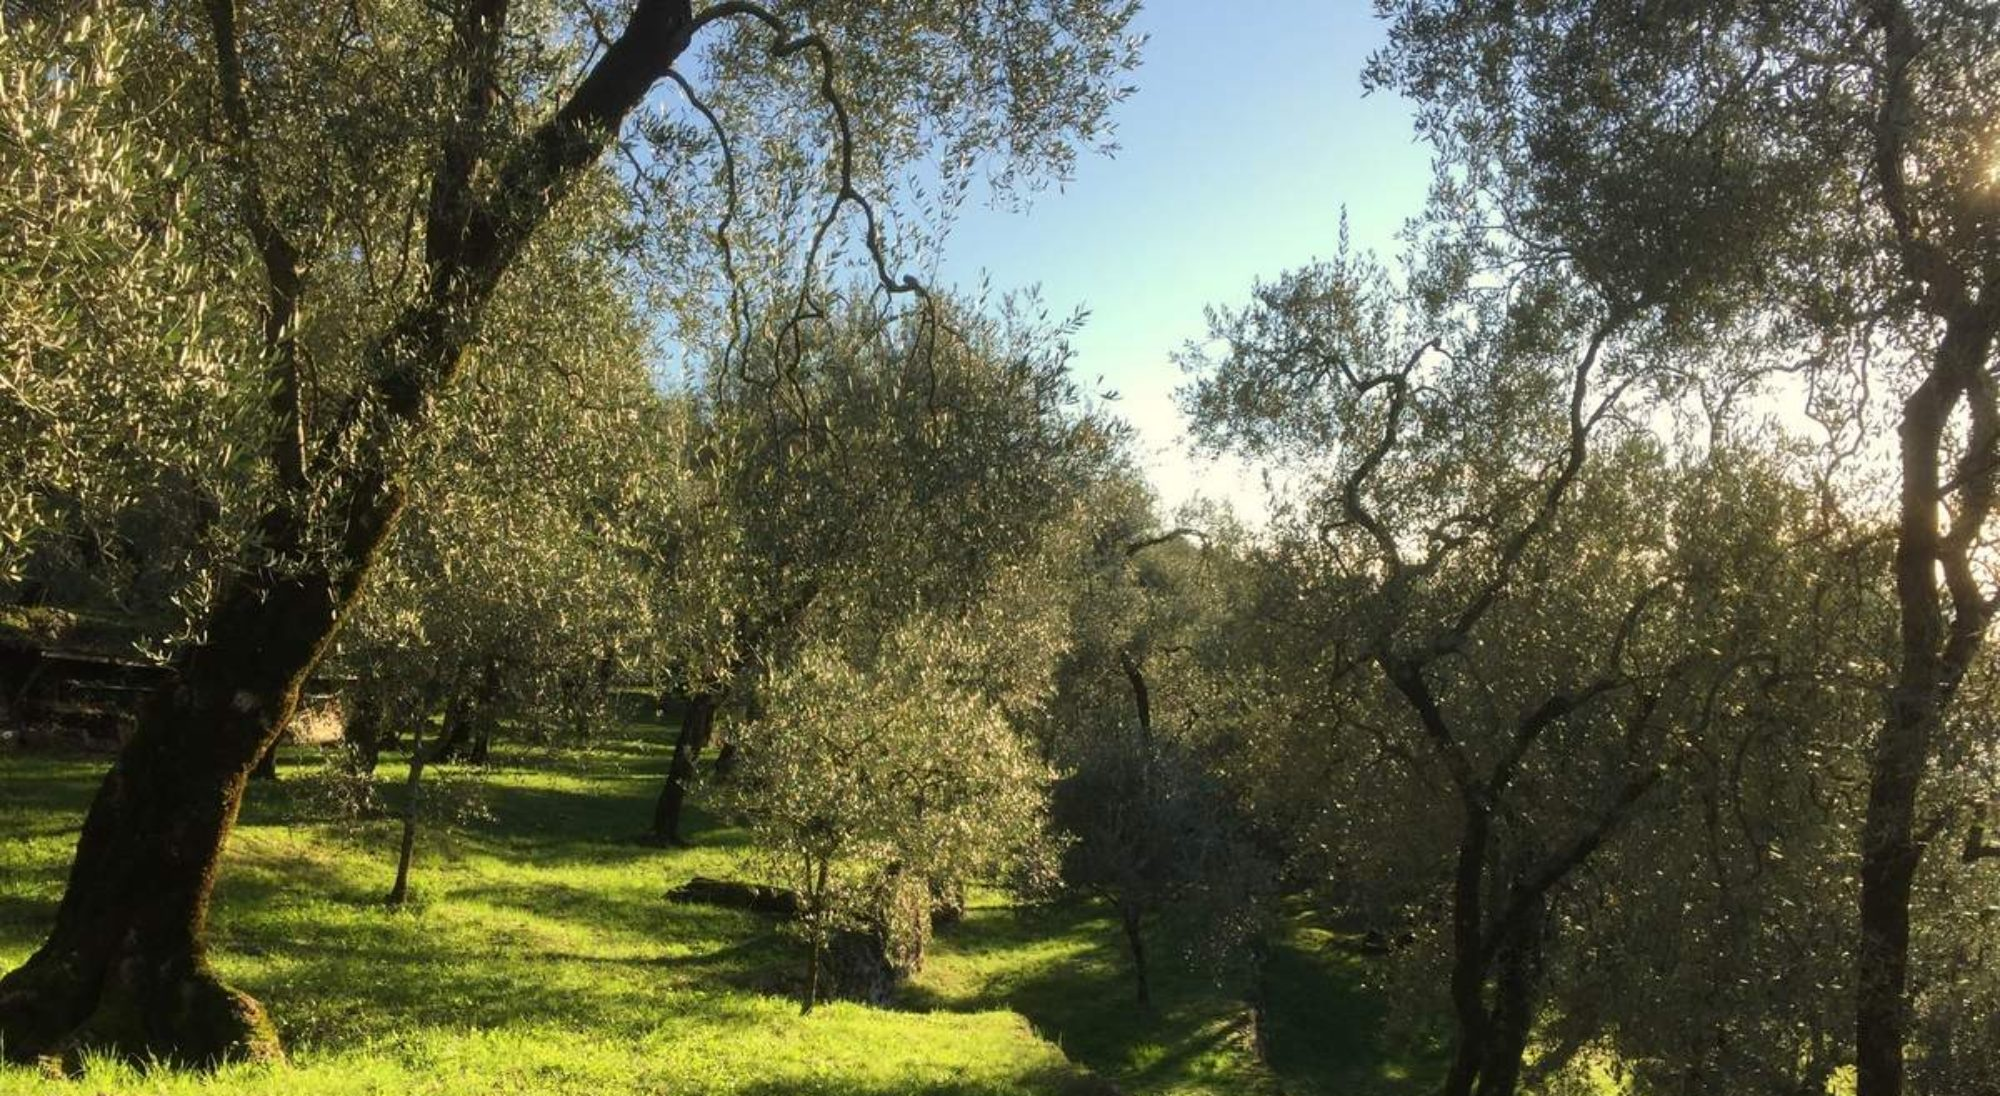 Olivenöl aus eigenem Anbau! Alles Ausverkauft. December 2020 kommt das nächste Olivenöl.